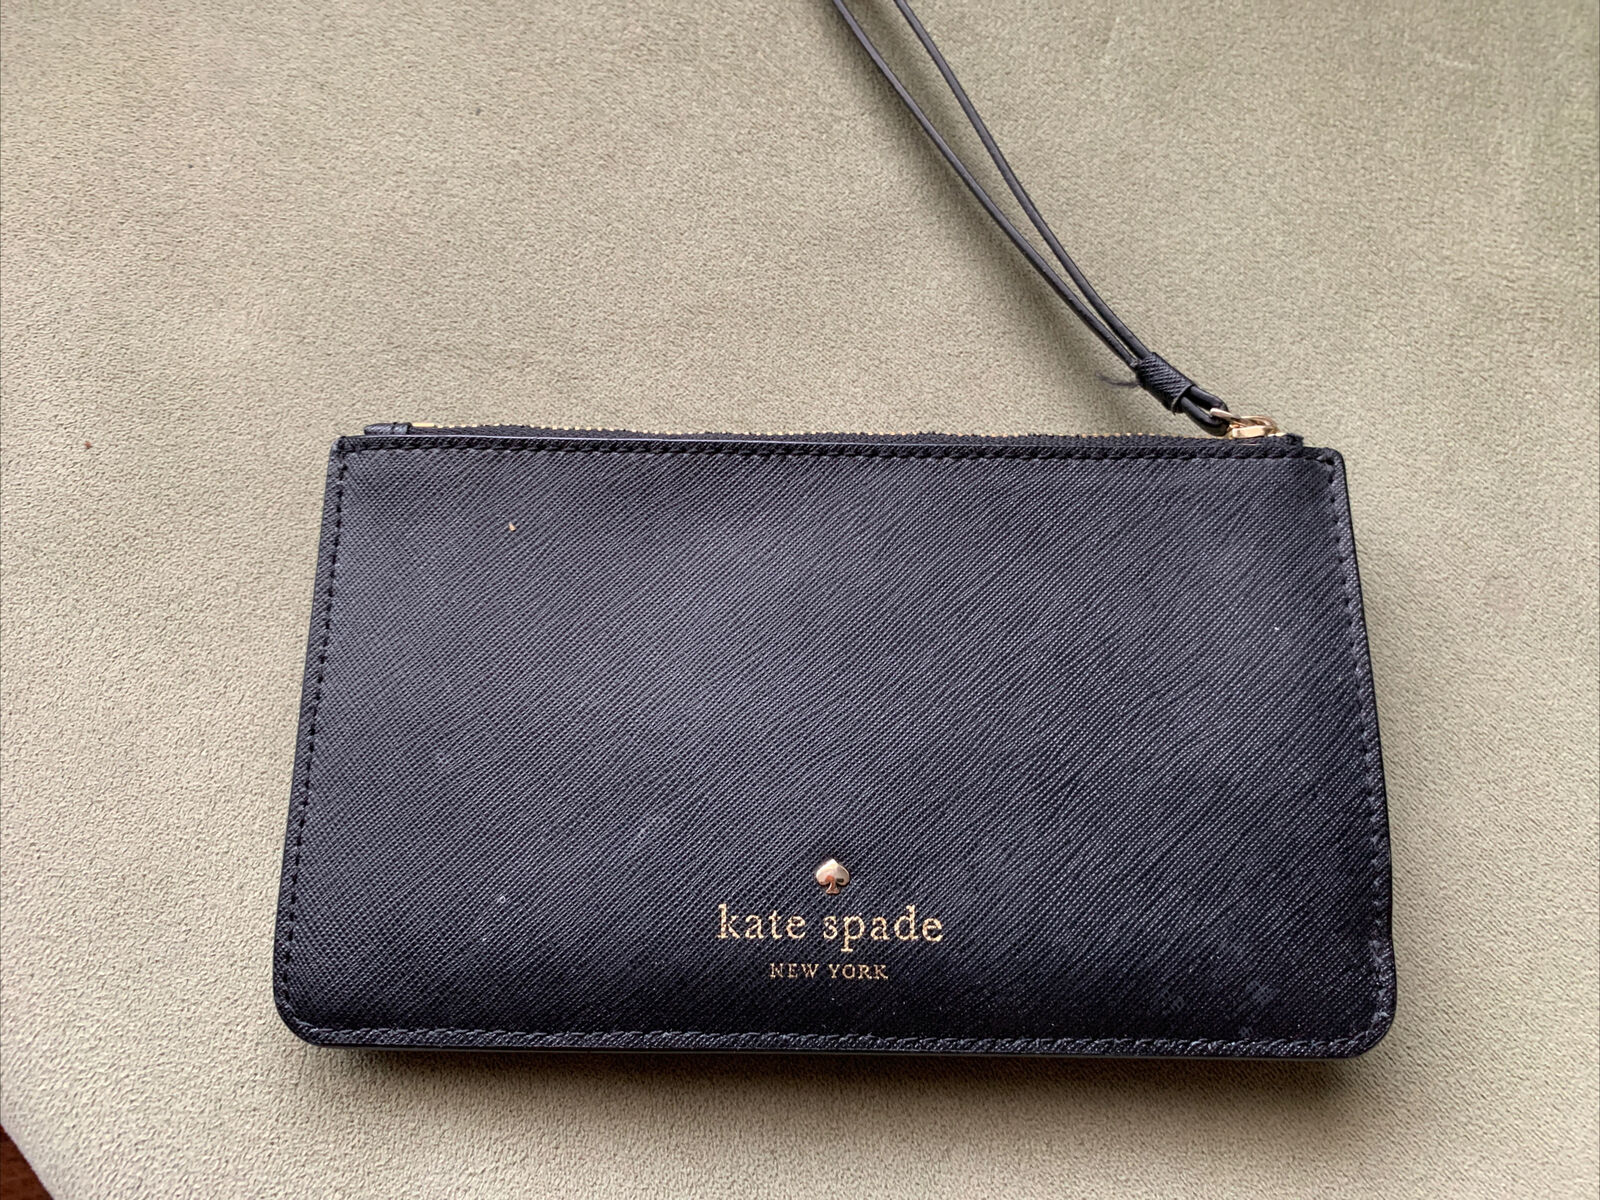 Kate Spade New York Black Wristlet Wallet With Card Slots